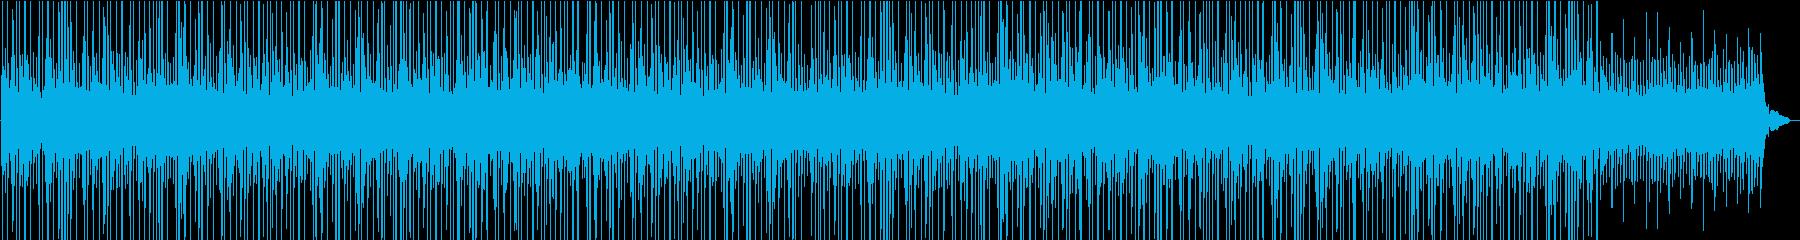 For heartwarming CM, chill lo-fi's reproduced waveform